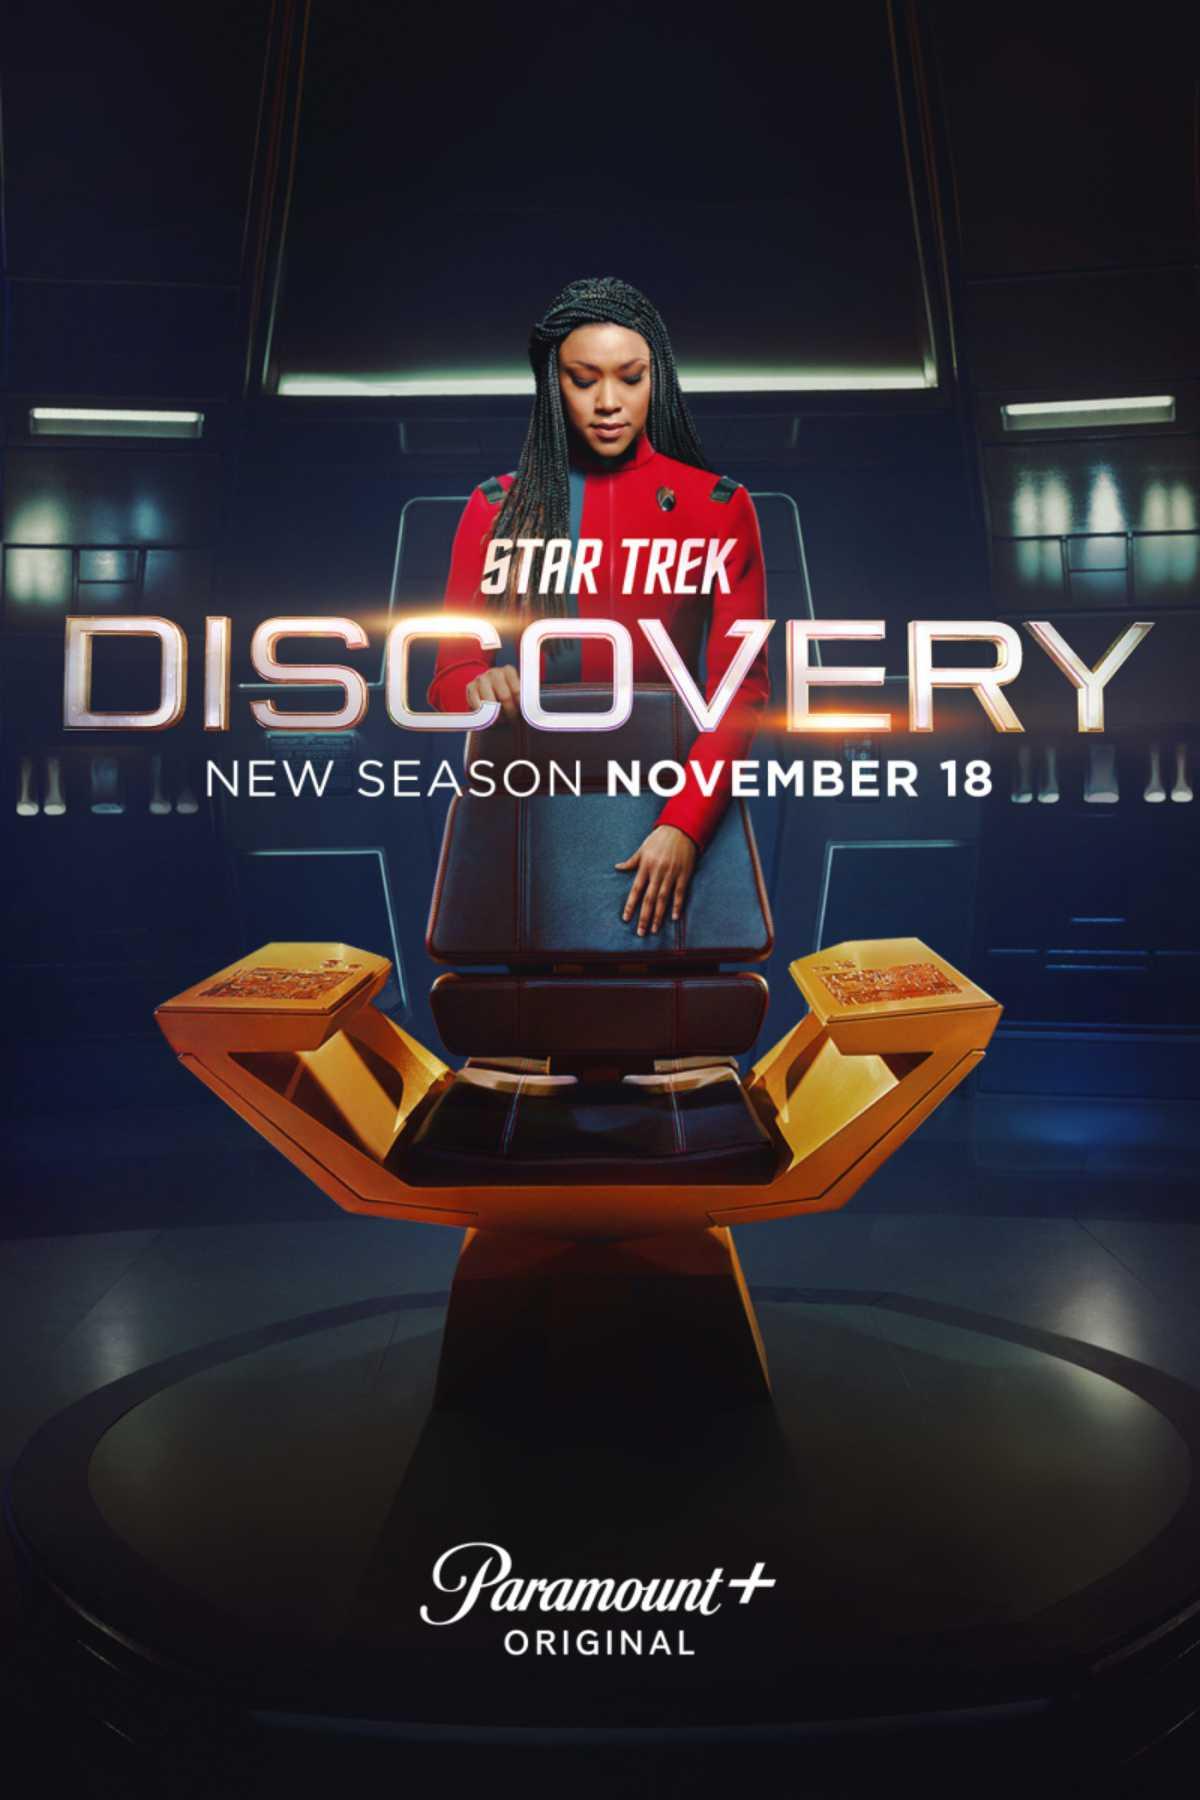 Discovery Season 4 Trailer